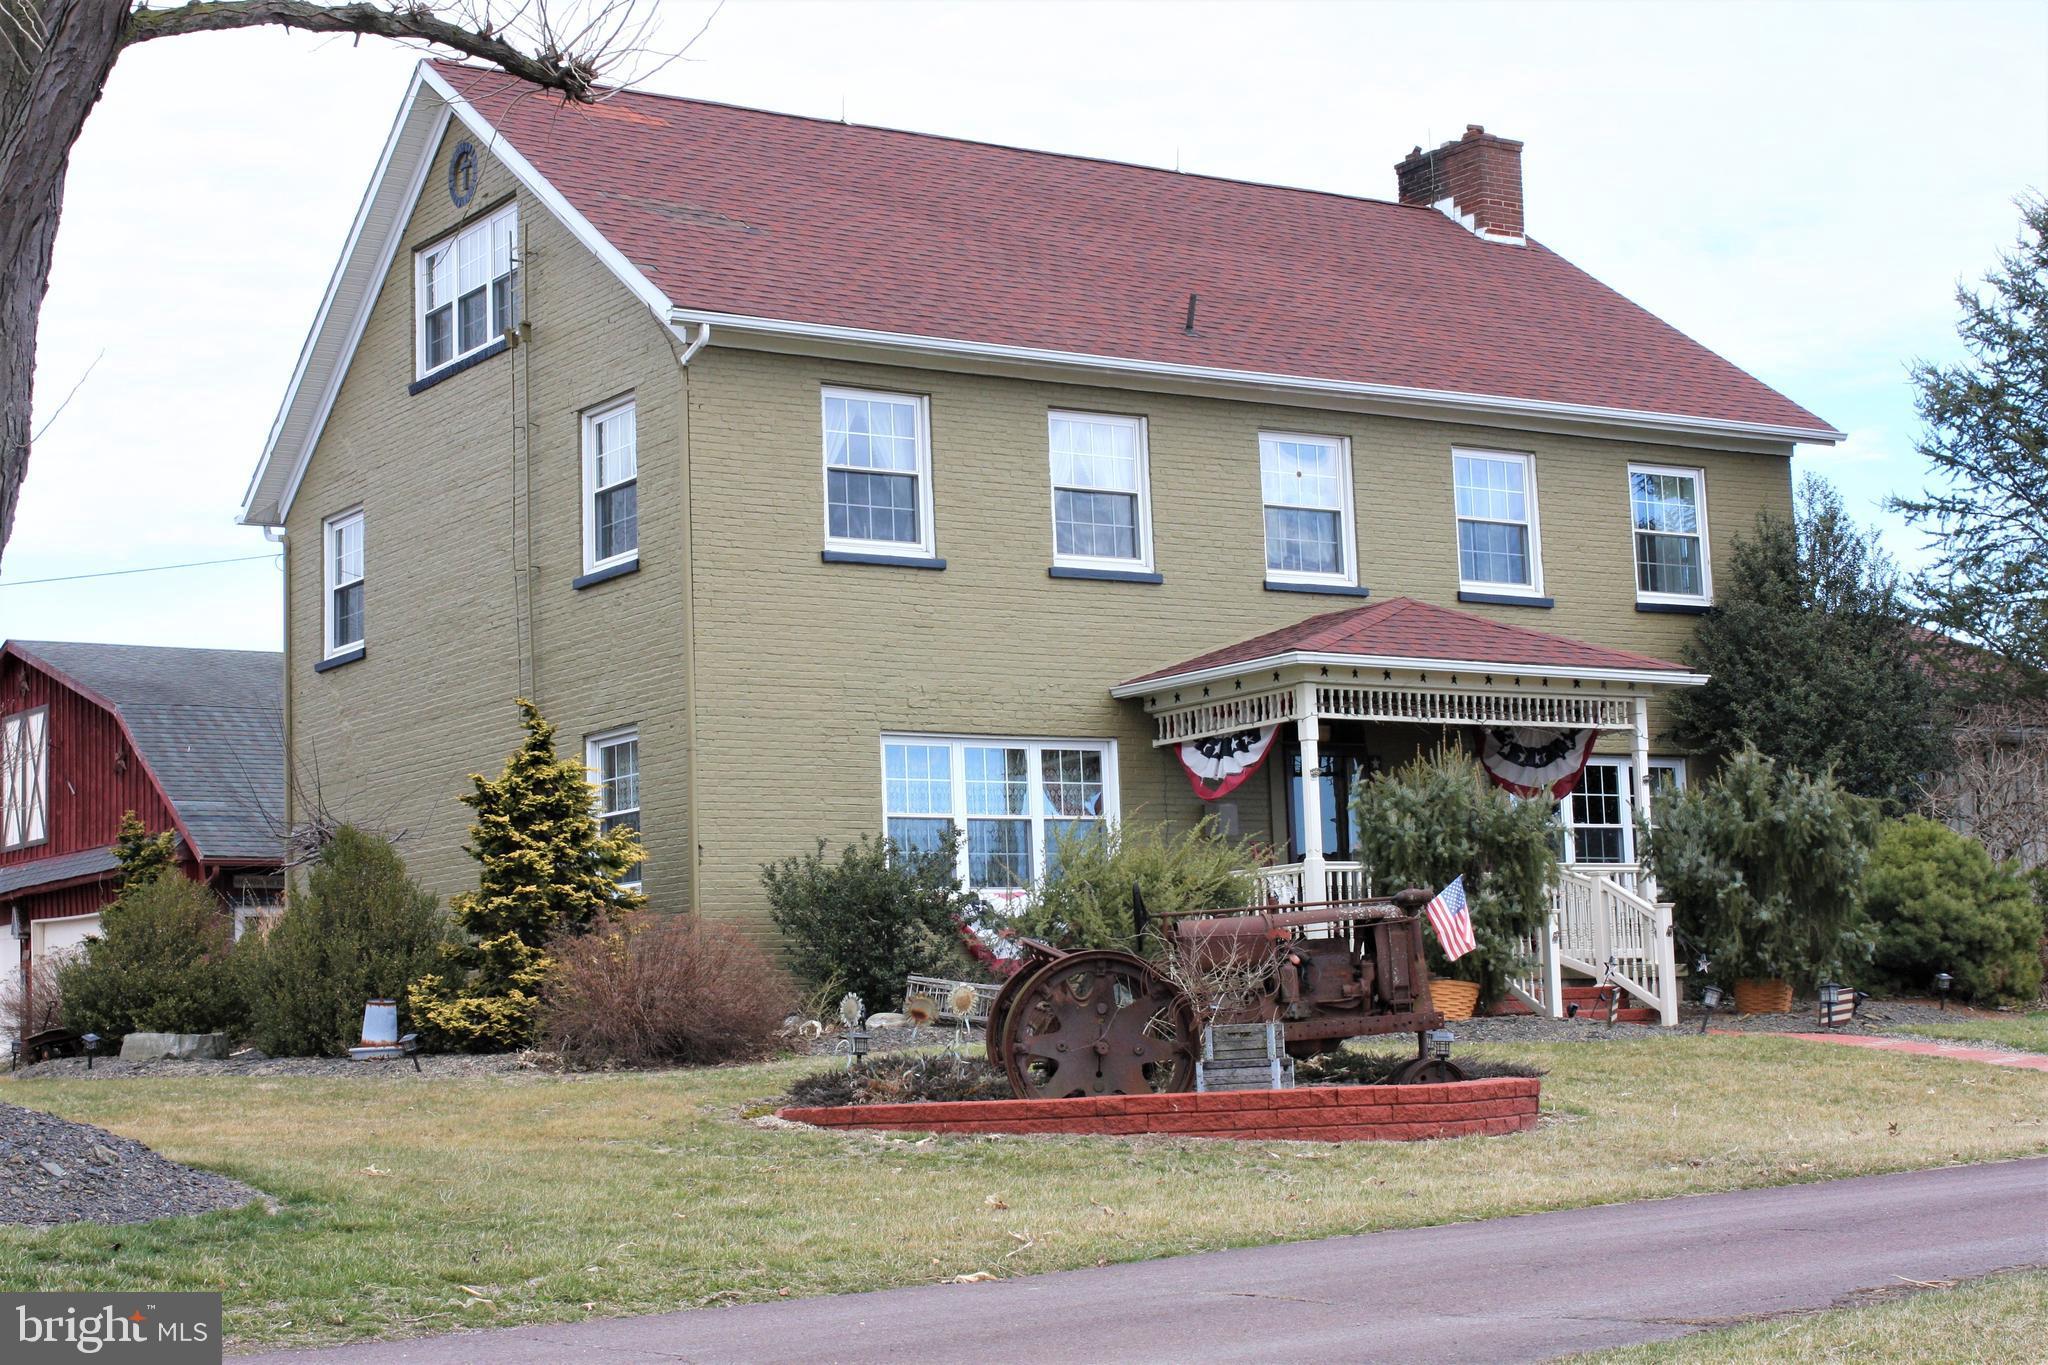 137 Bomboy Ln, Berwick, PA, 18603